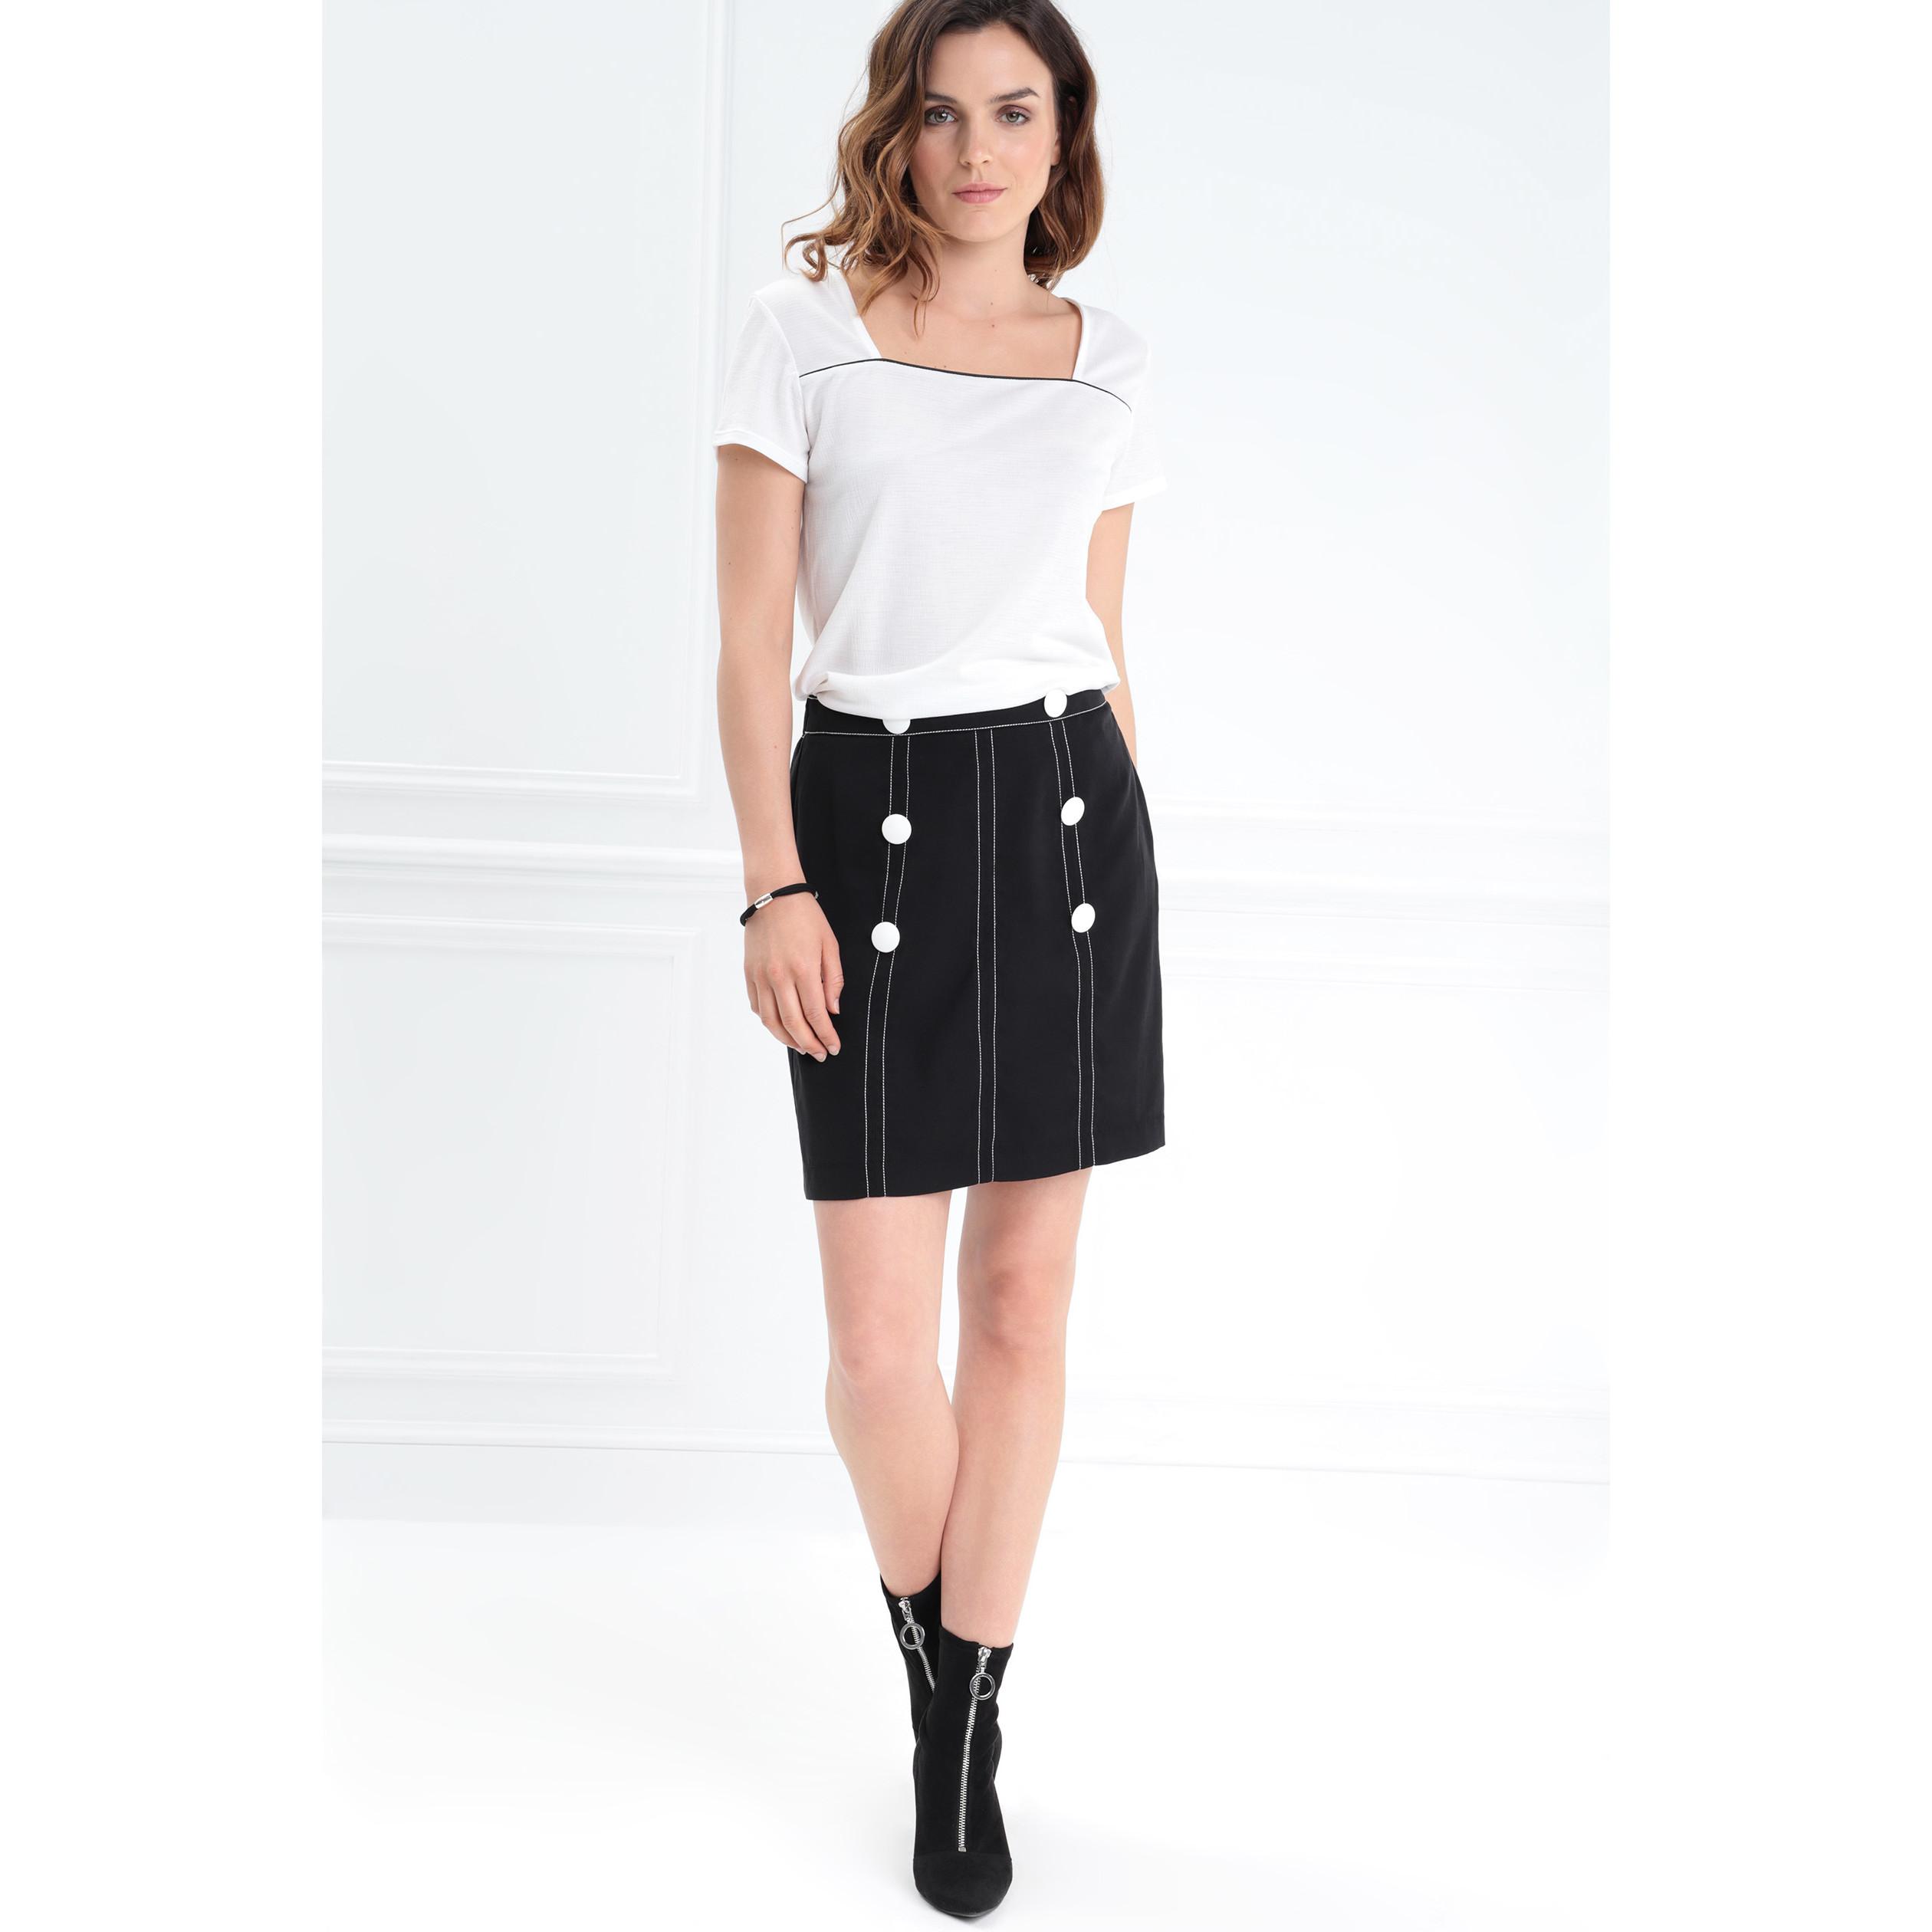 301e643a0b3a9a Jupe coutures contrastantes noir femme